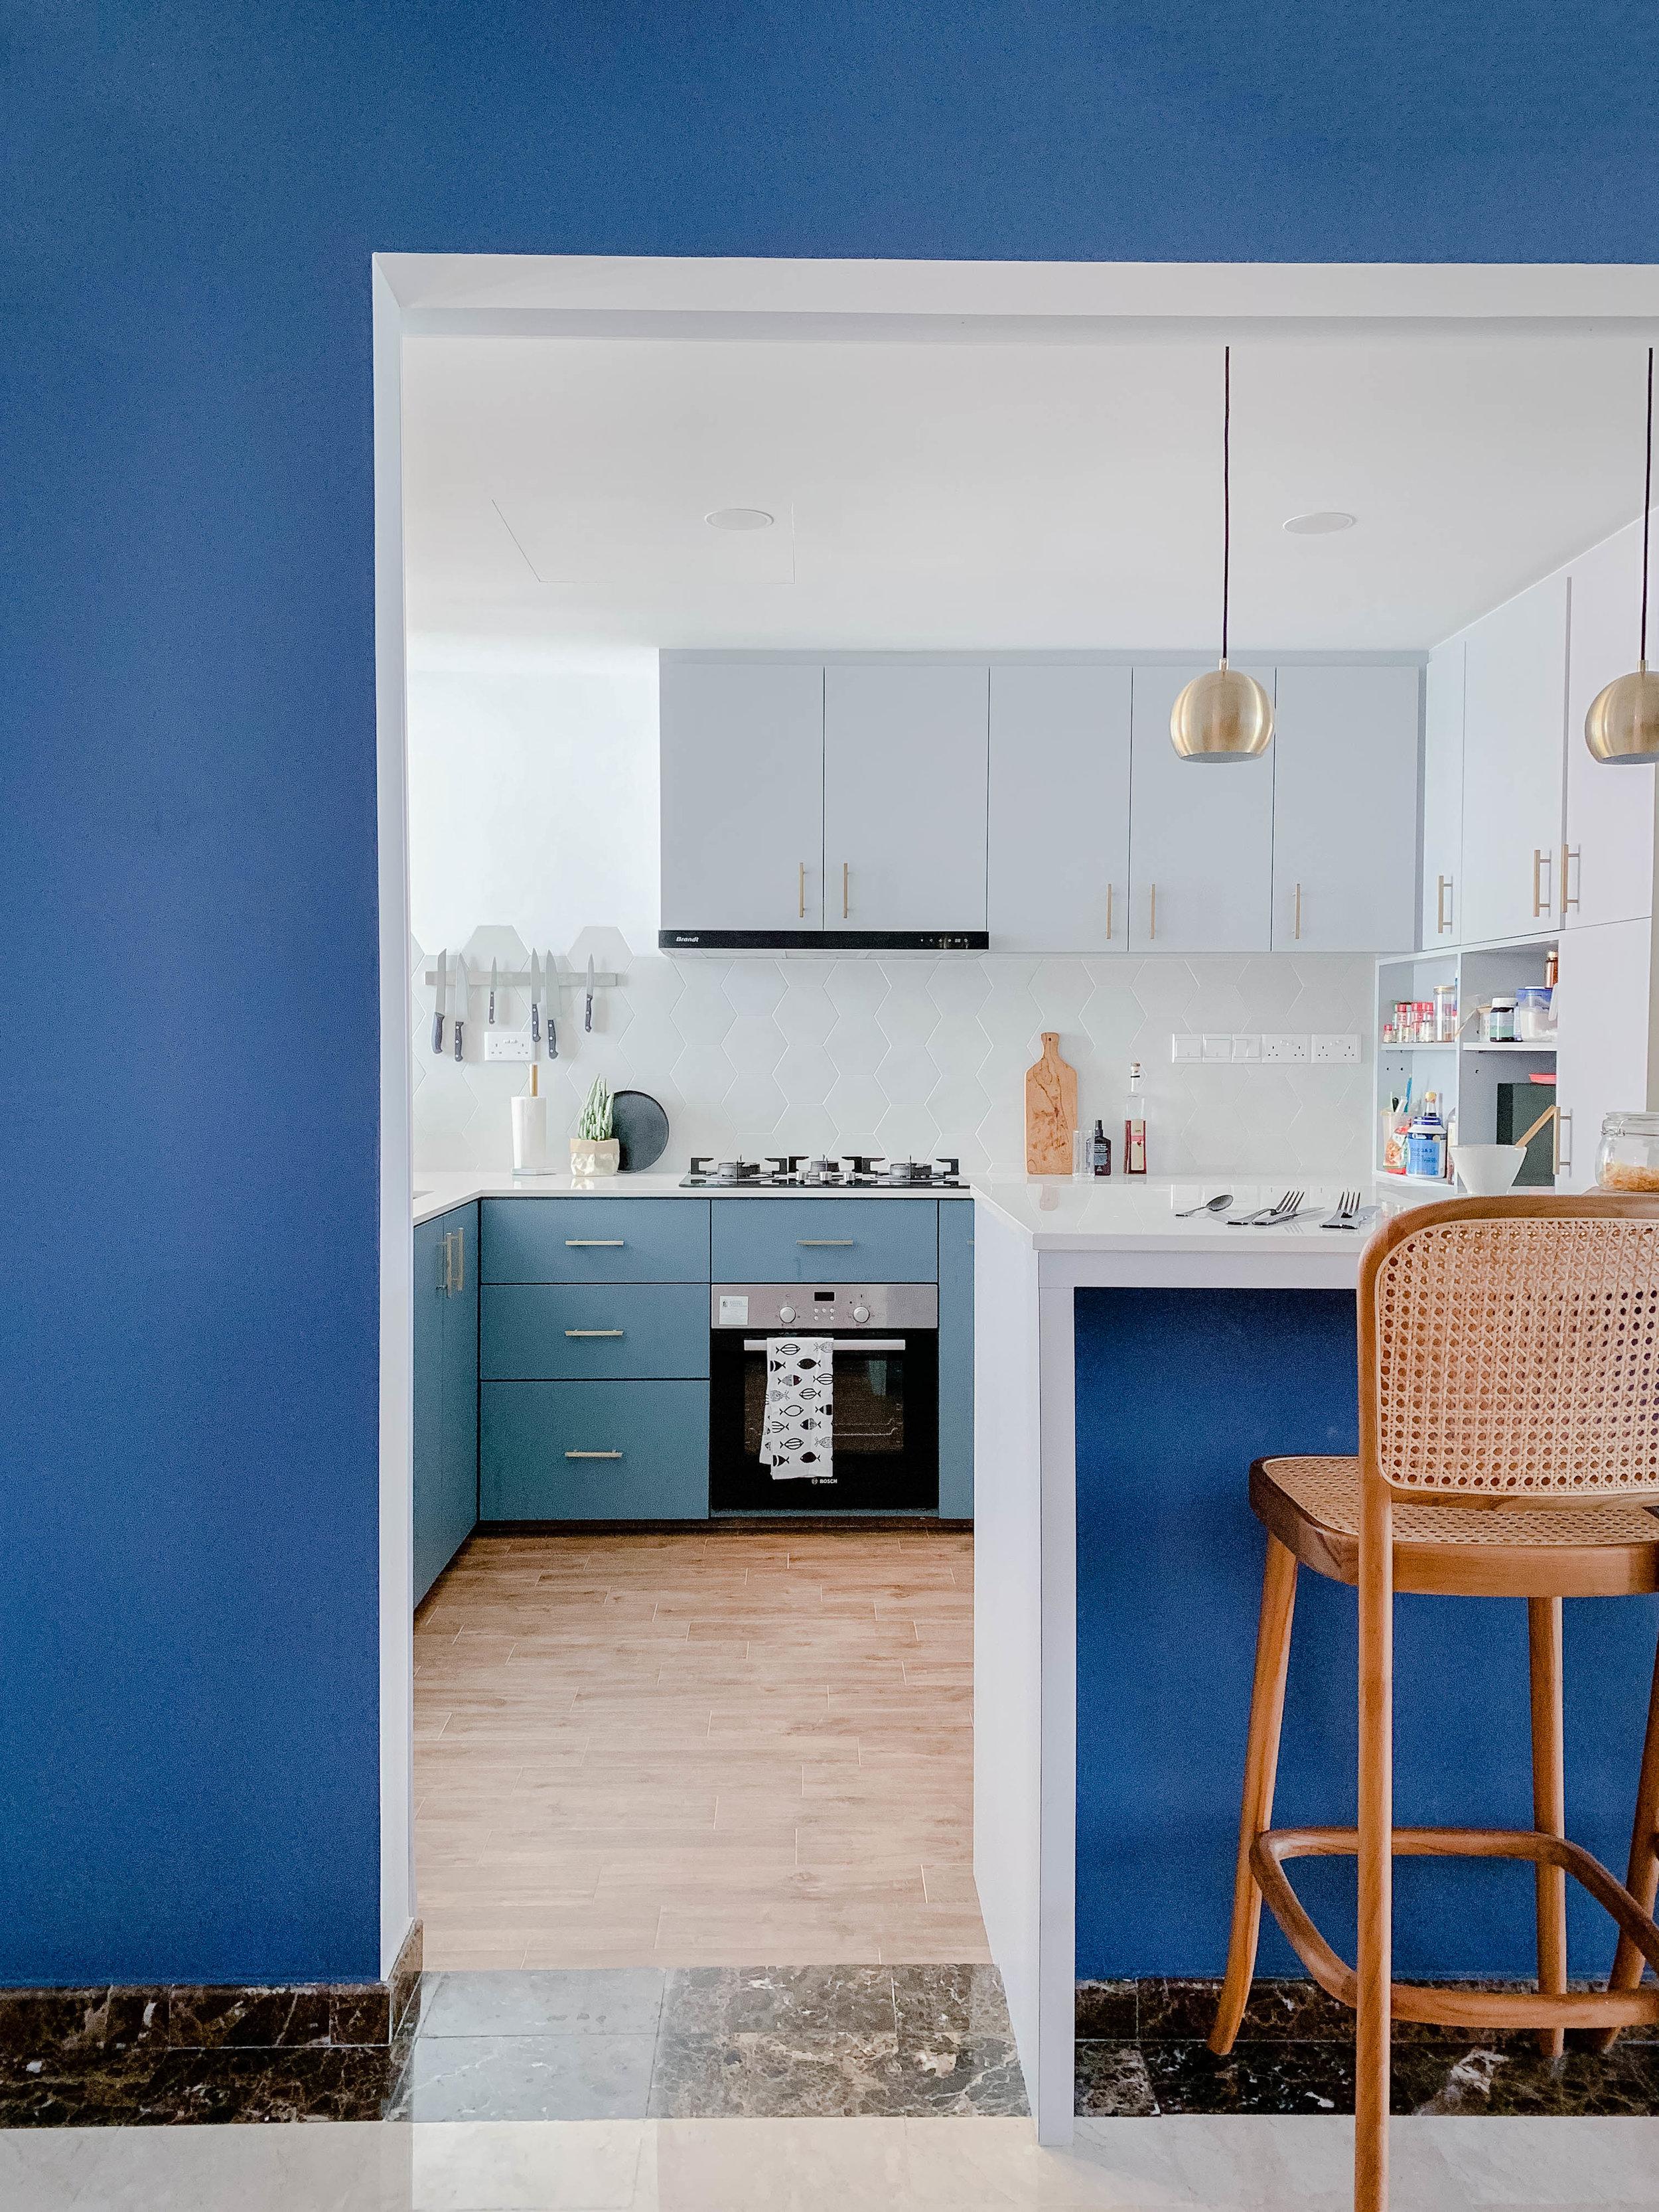 Urban Home Makeover Design (12 of 14).jpg